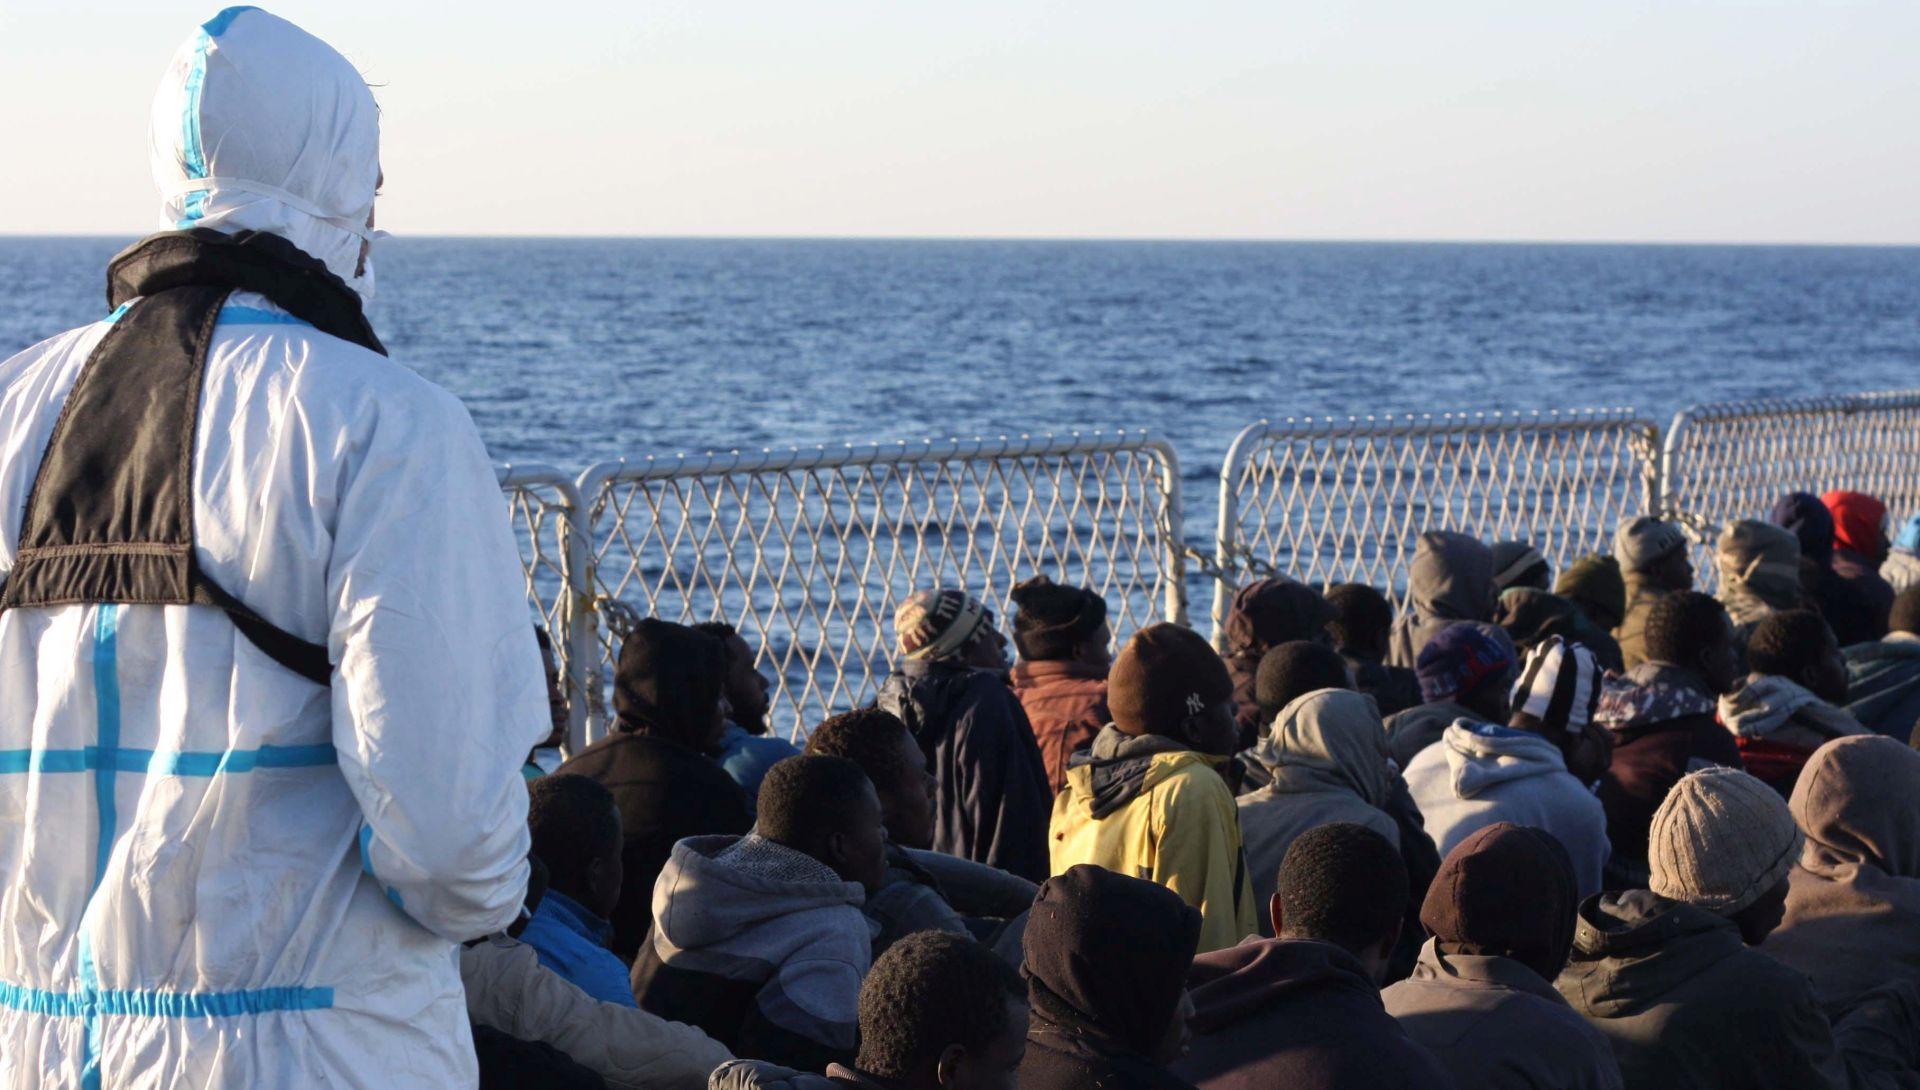 Švedska, Finska, Nizozemska žele vratiti migrante, nova utapanja u Sredozemnom moru